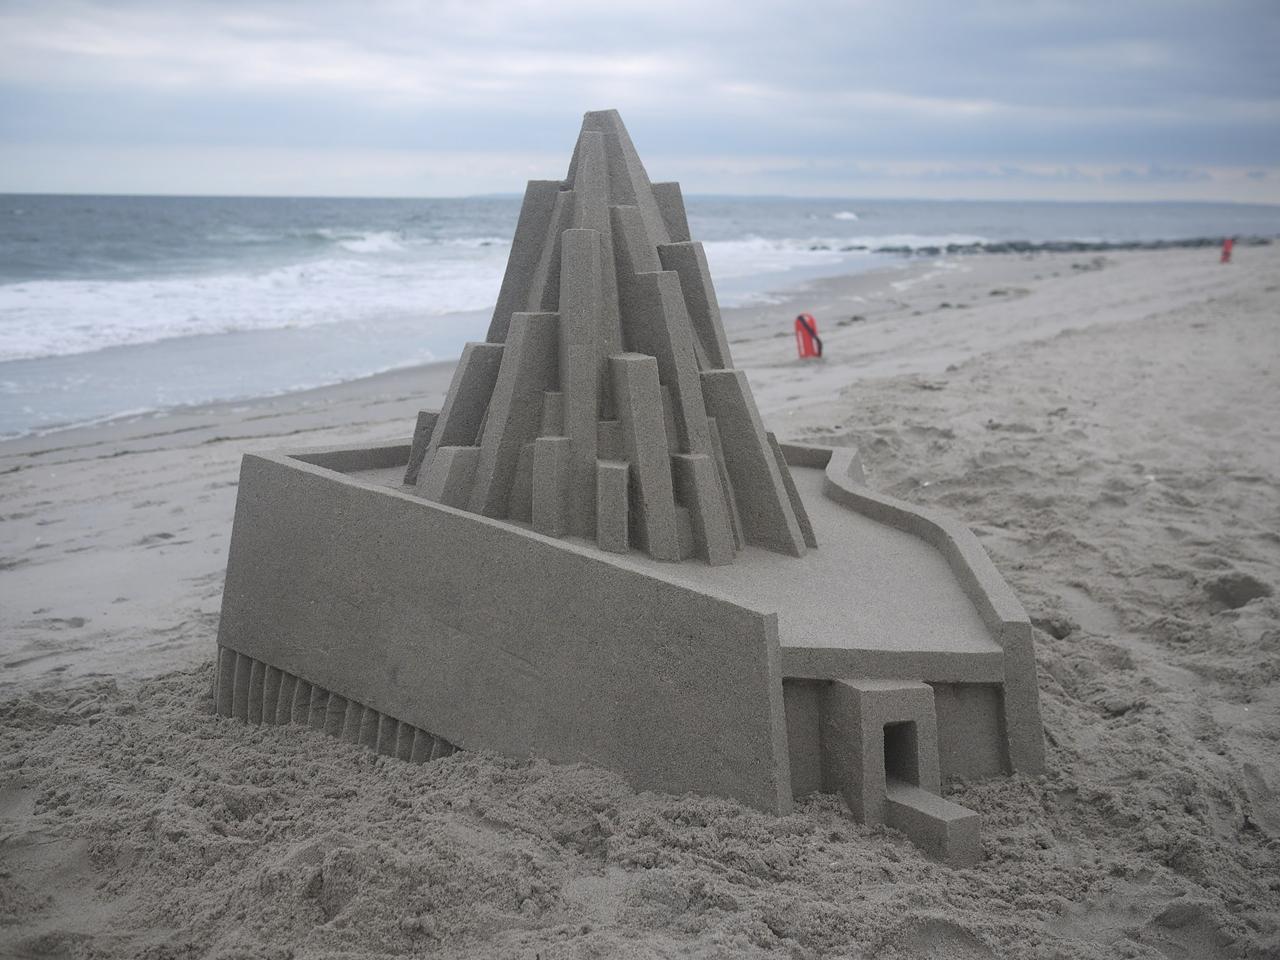 sand-castles-07